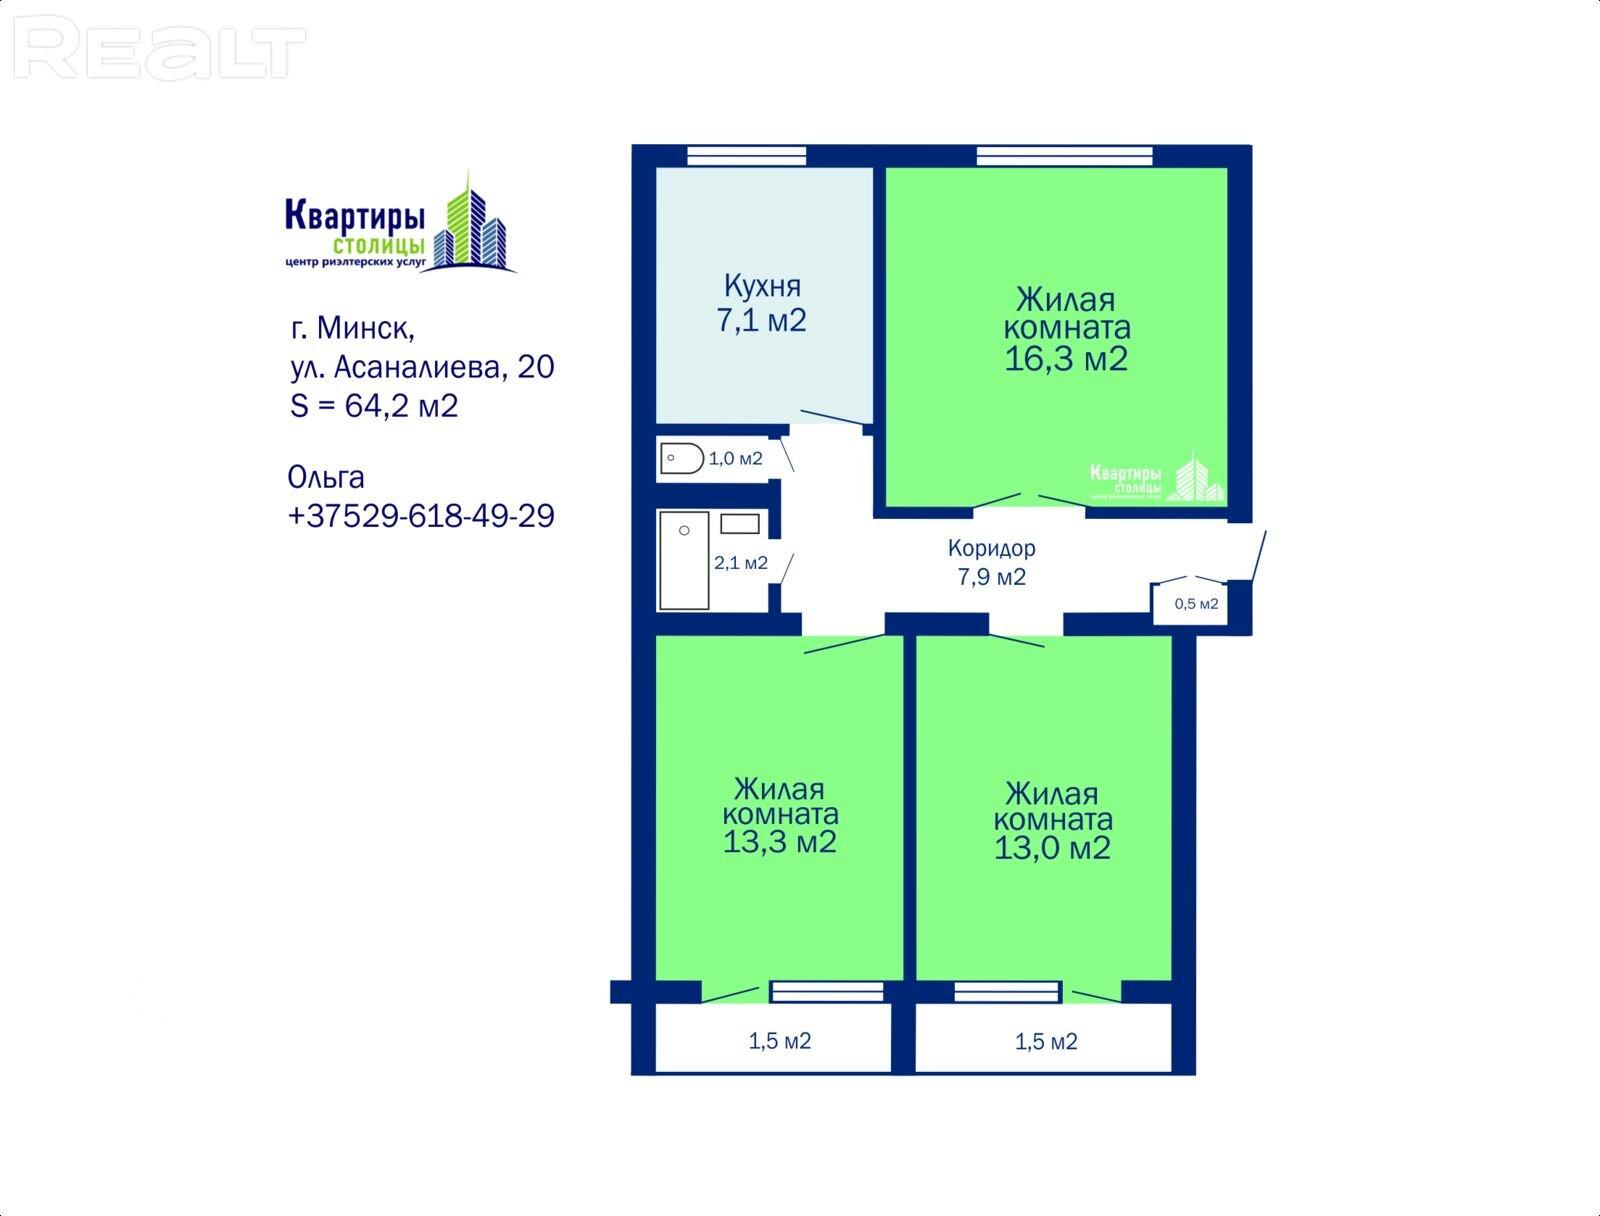 Продажа 3-х комнатной квартиры в г. Минске, ул. Асаналиева, дом 20 (р-н Серова). Цена 150 012 руб c торгом